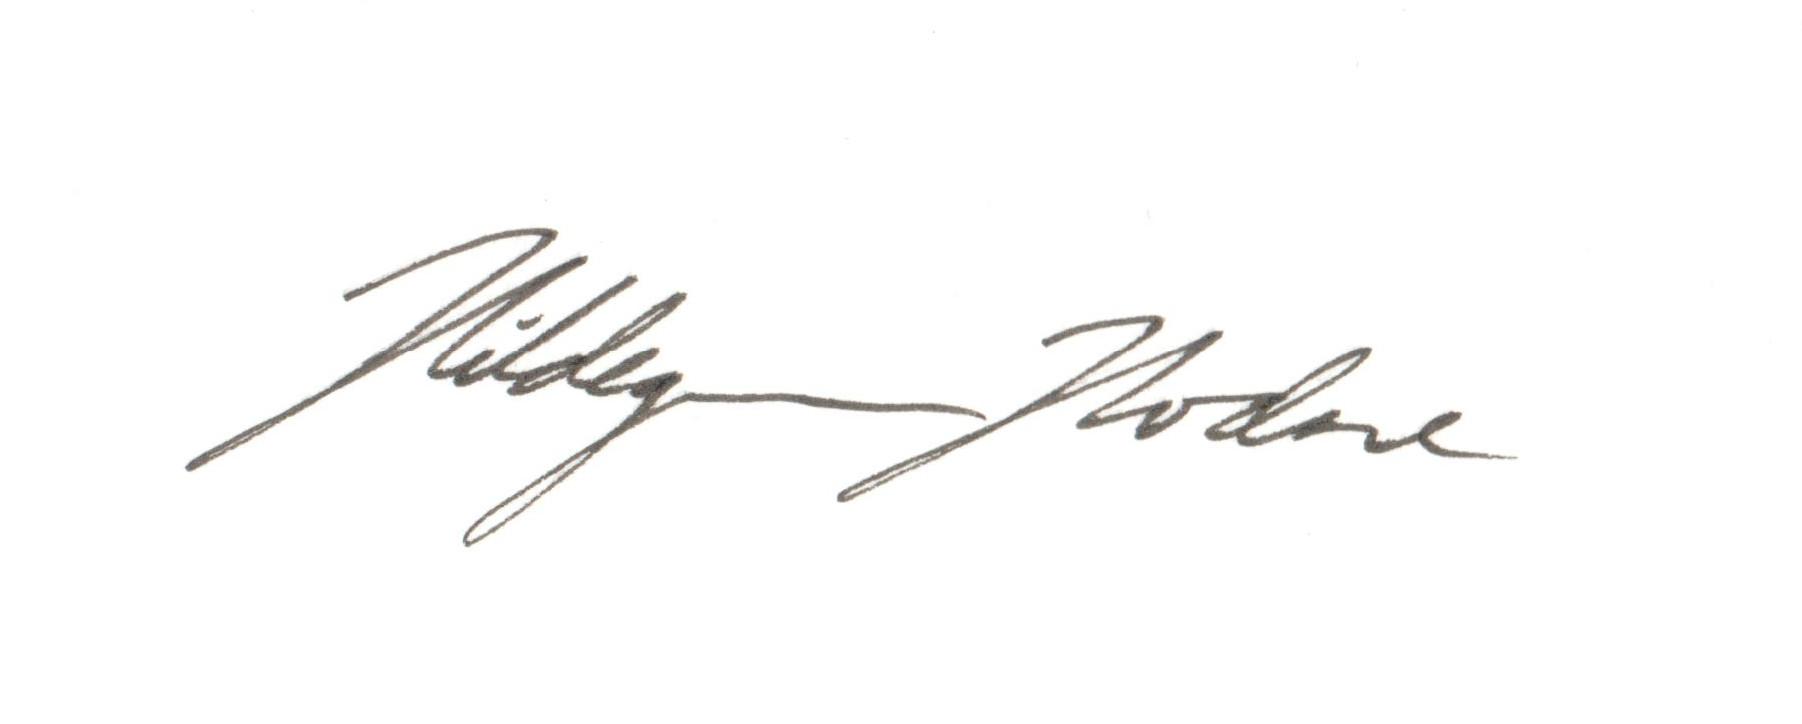 Hildegunn Hodne's Signature